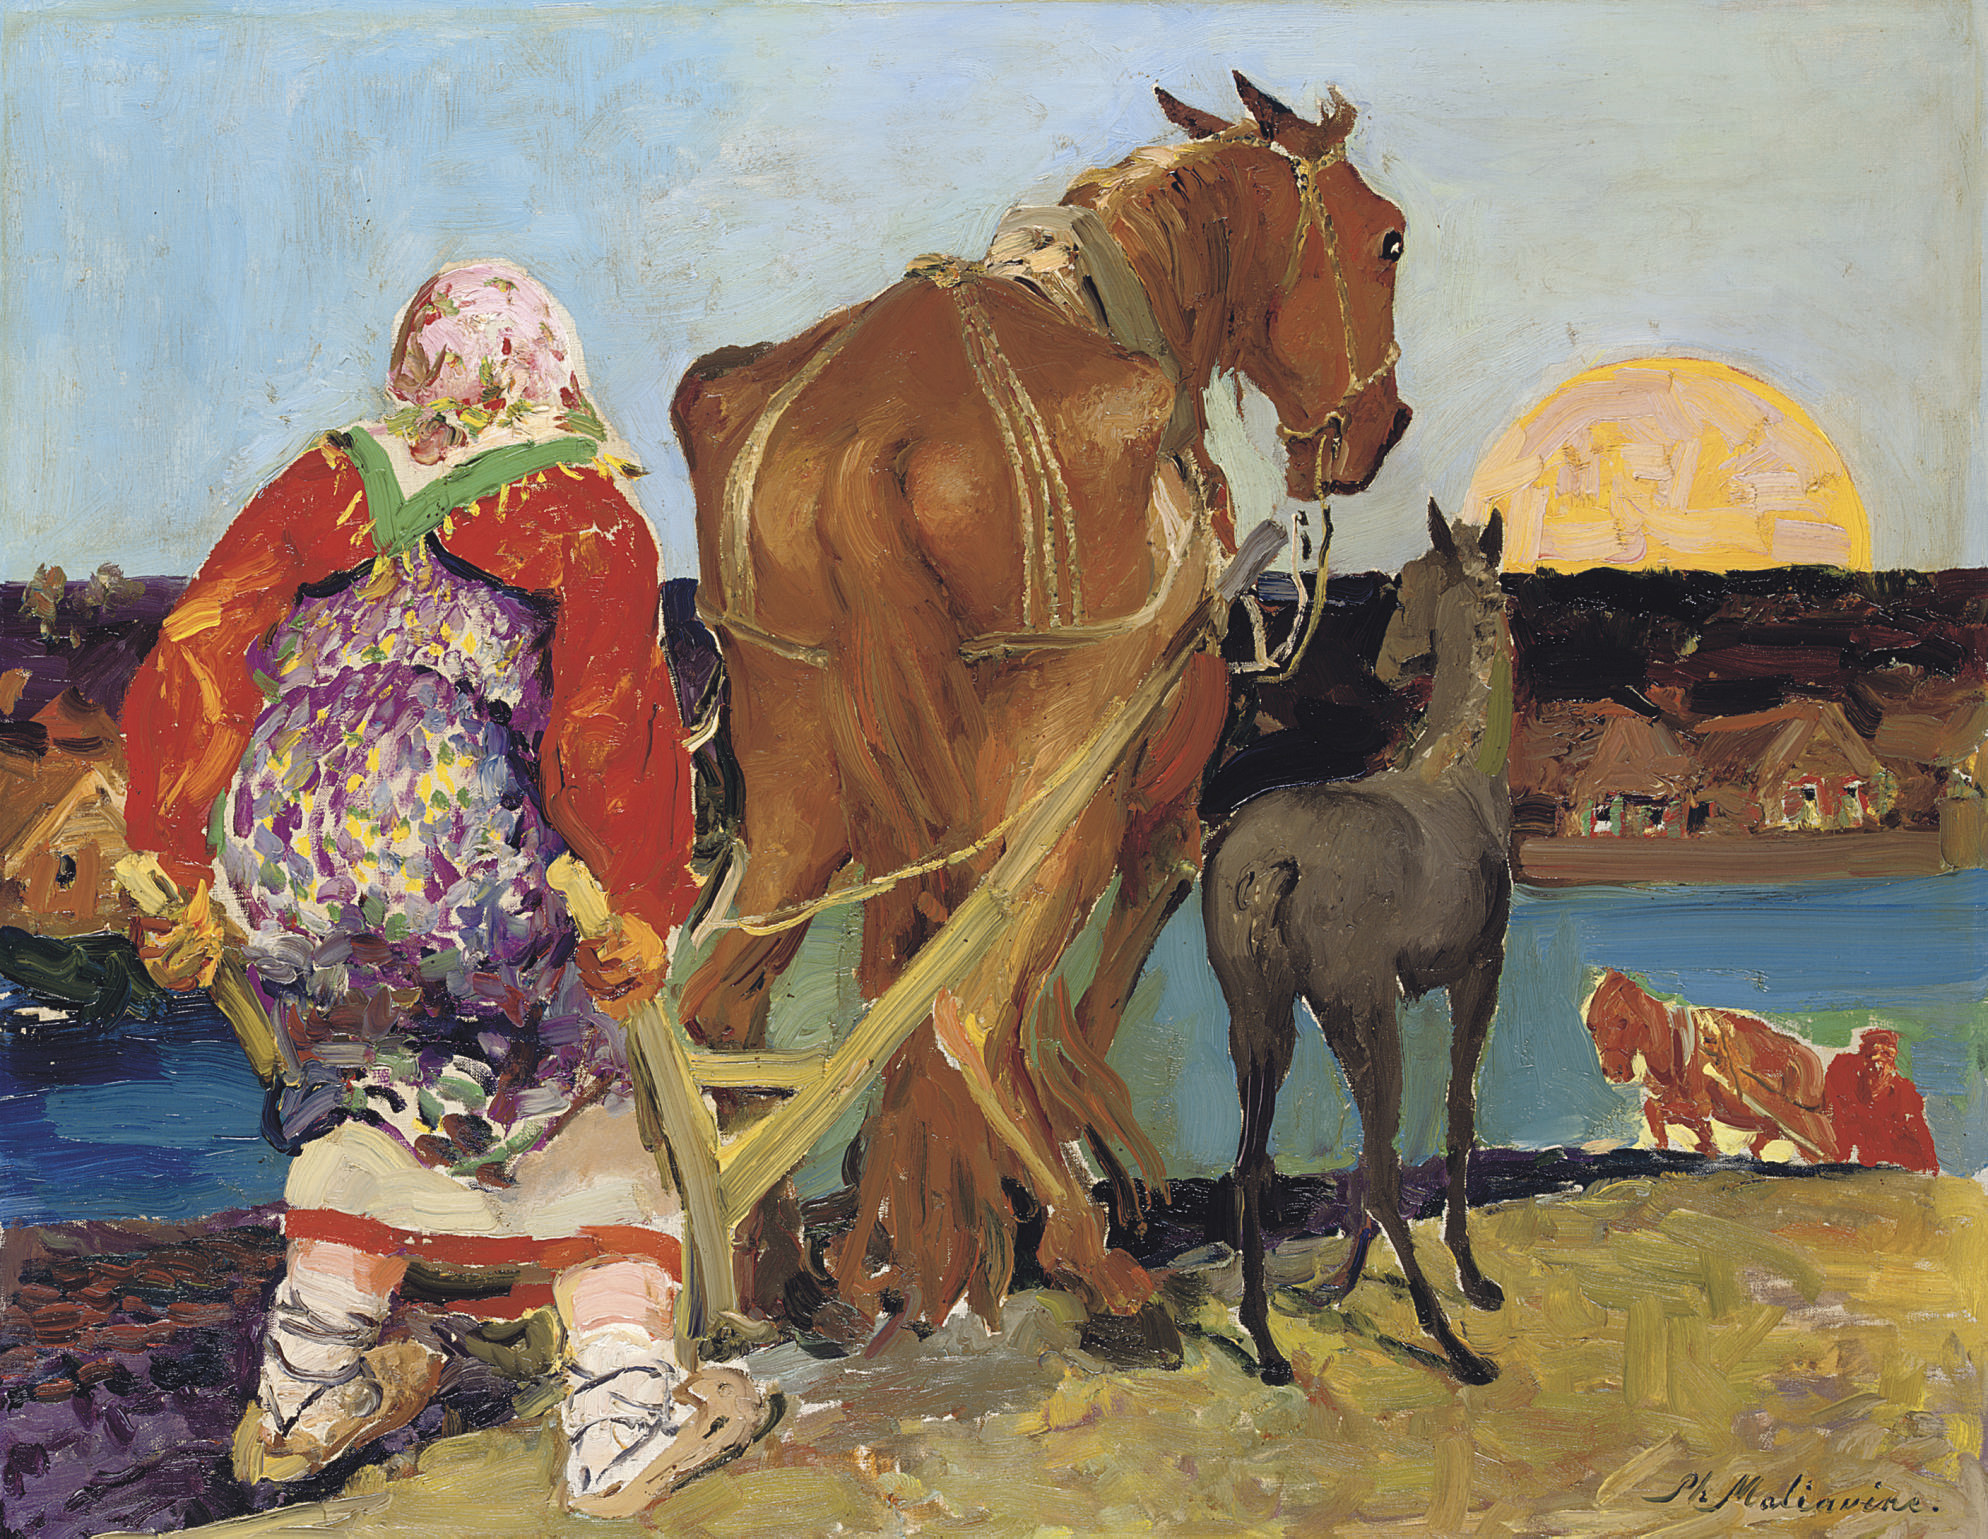 Filipp Maliavin (1869-1940)